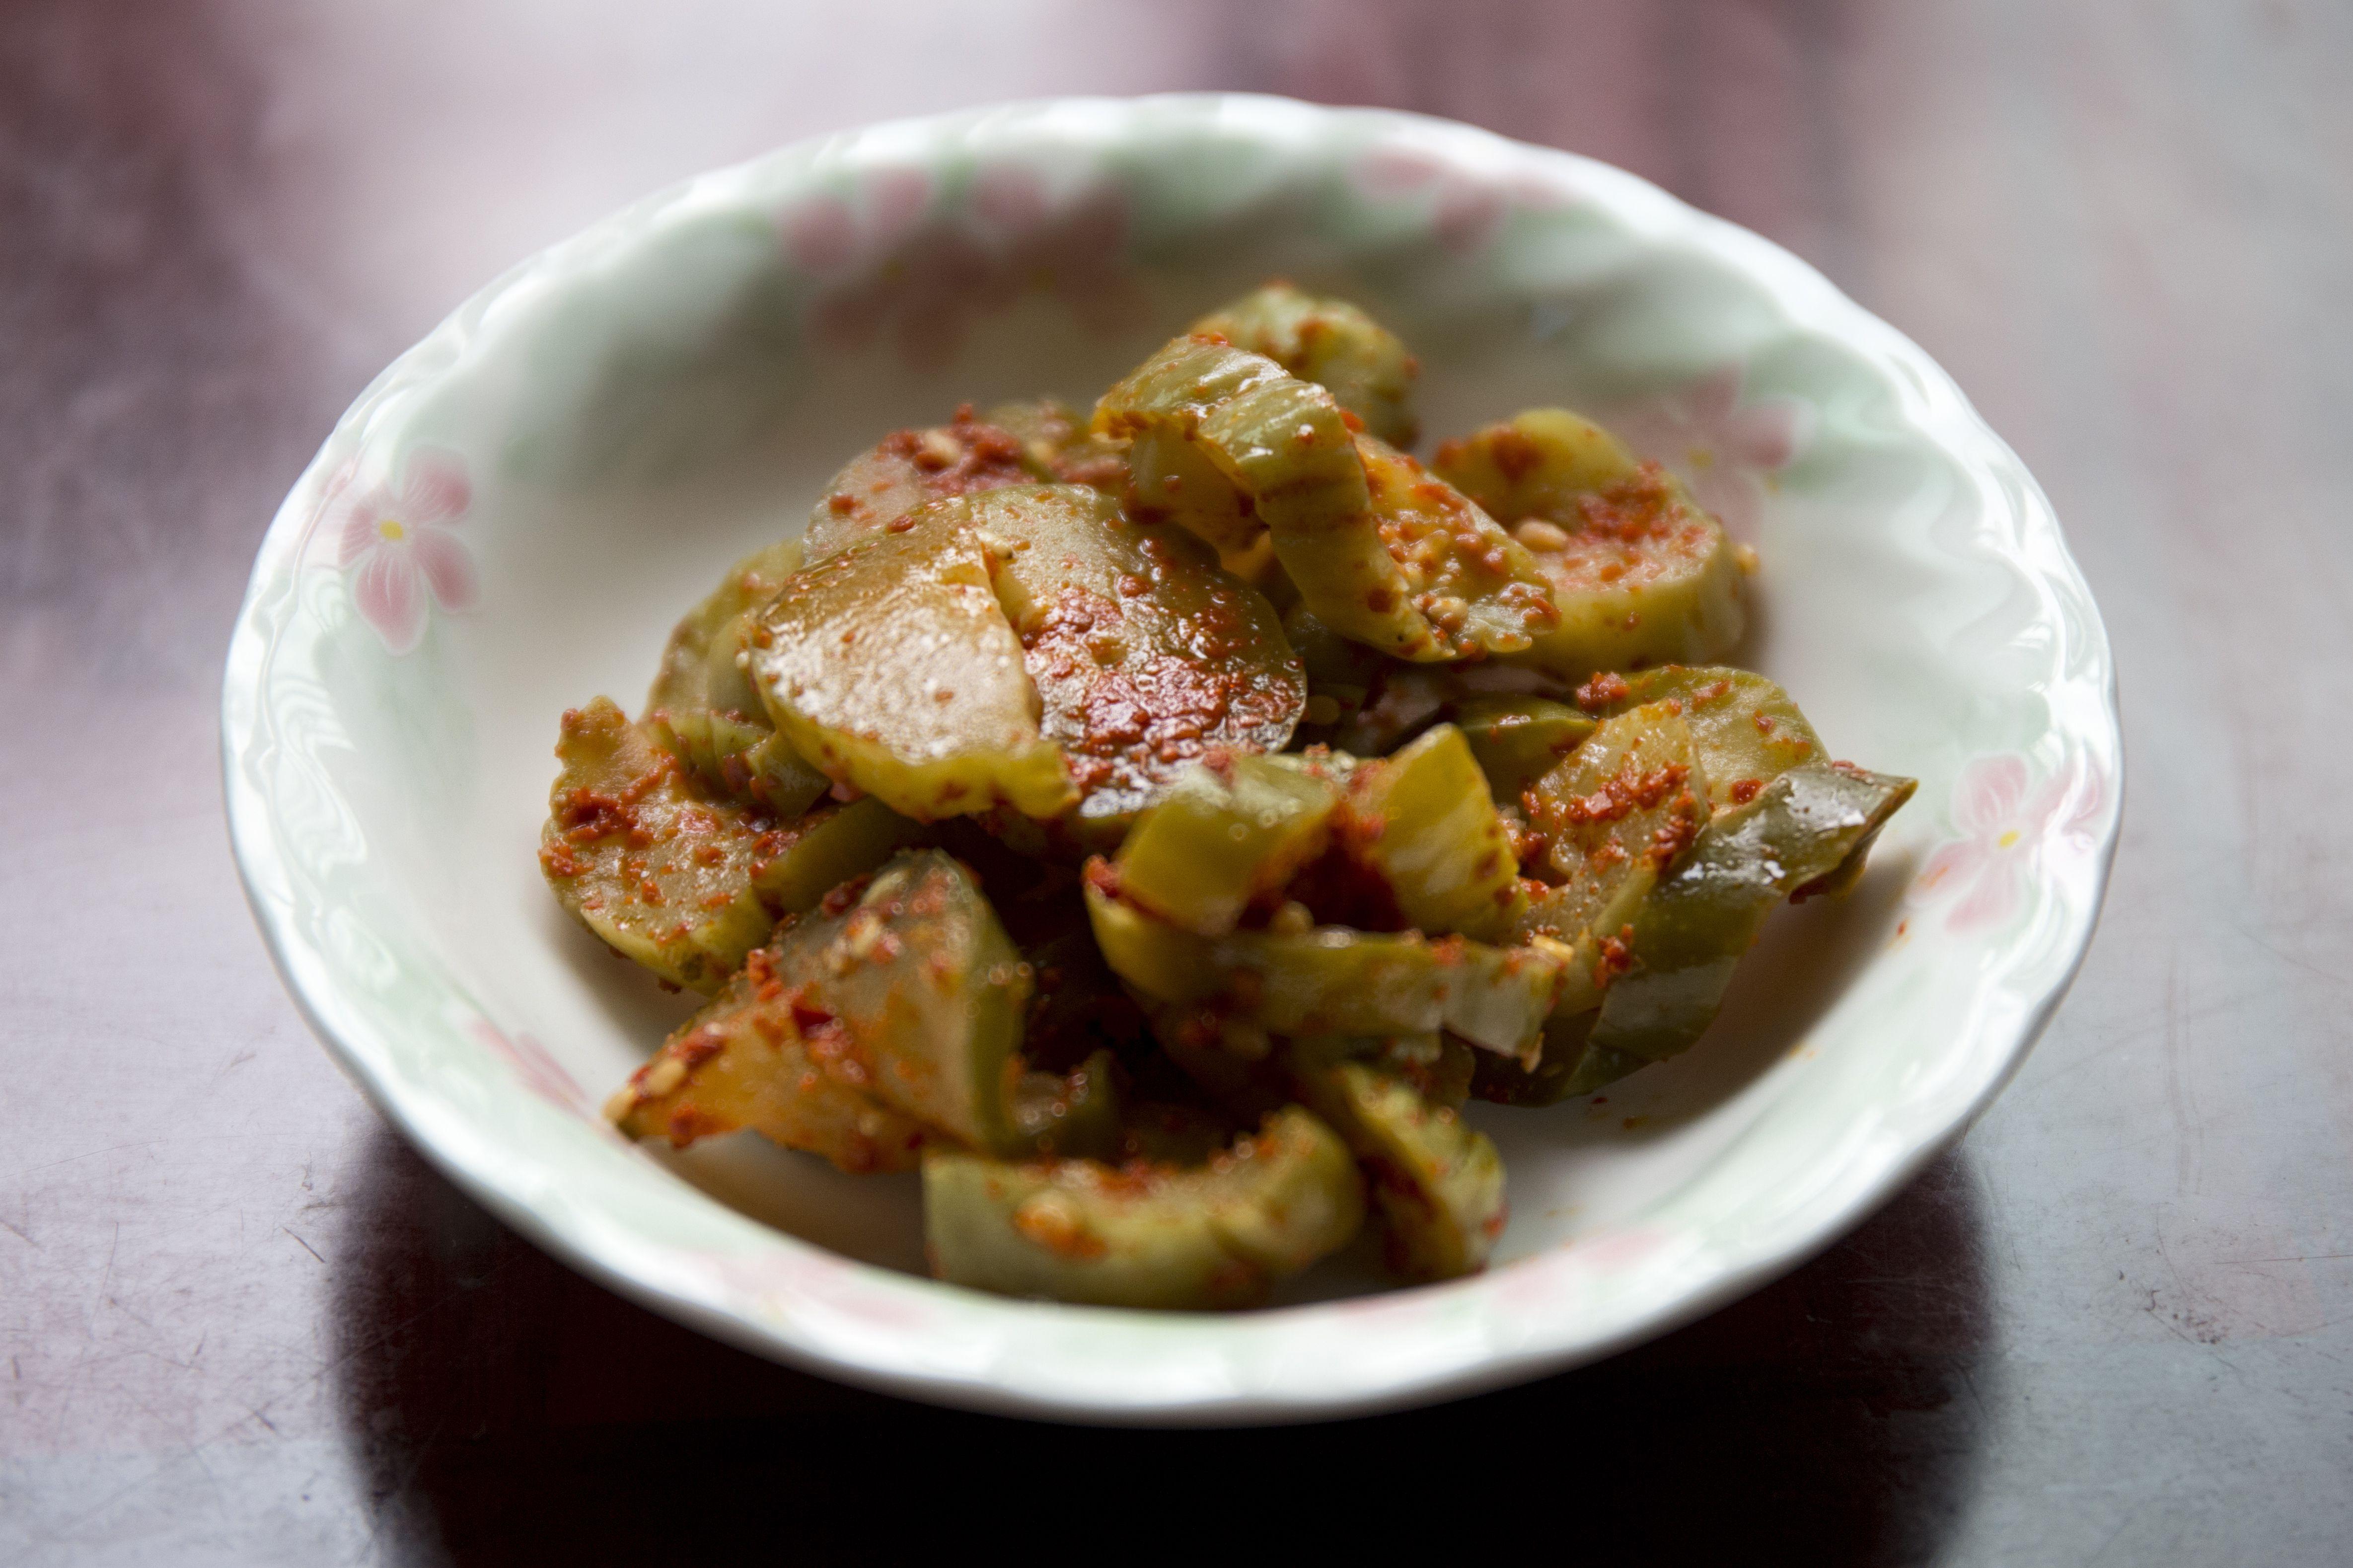 Korean side dish, pickled cucumber